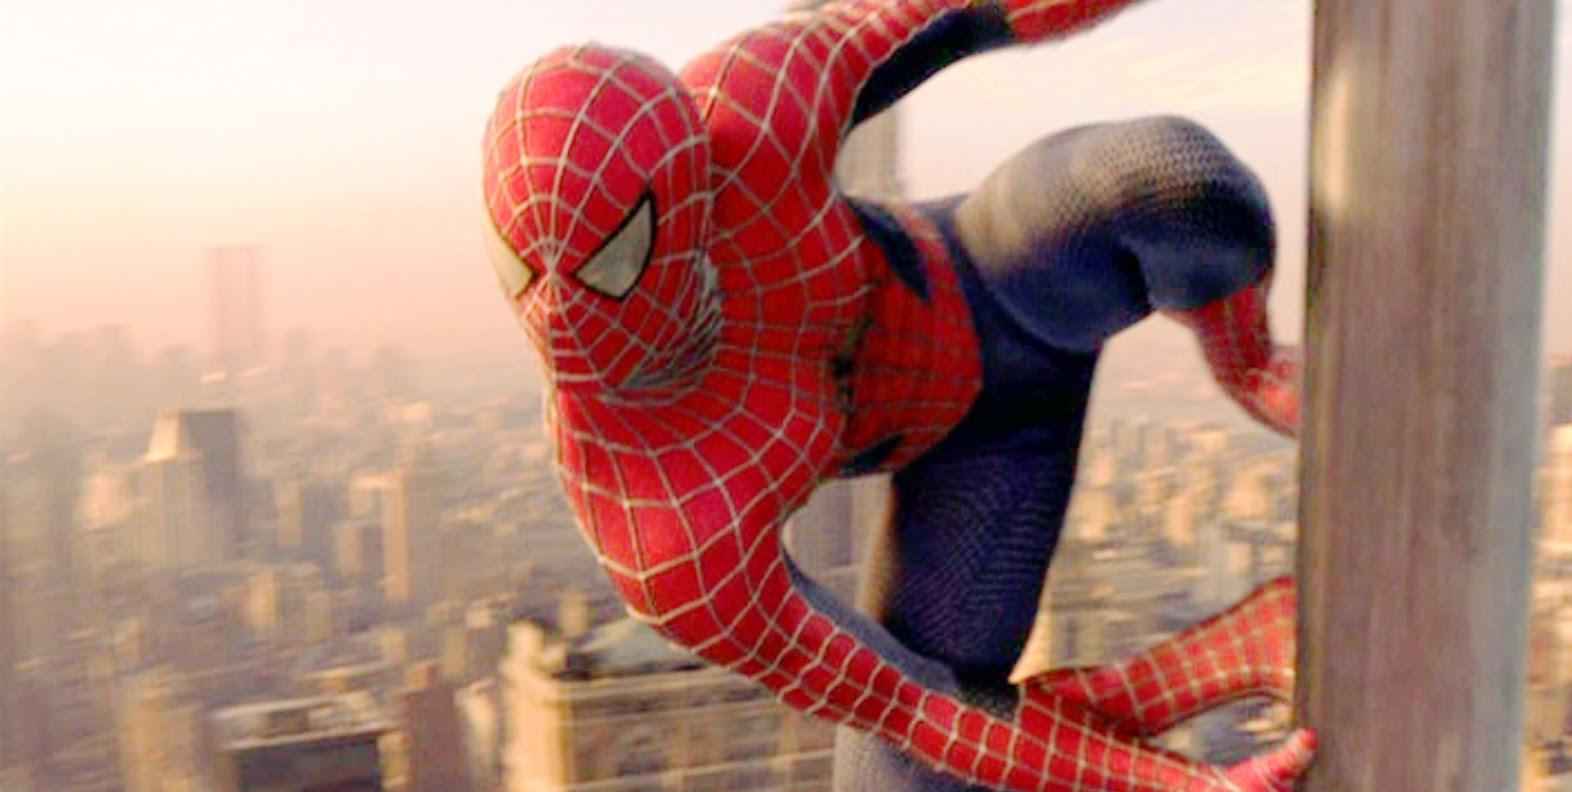 spiderman visual effects swinging jpg 1152x768